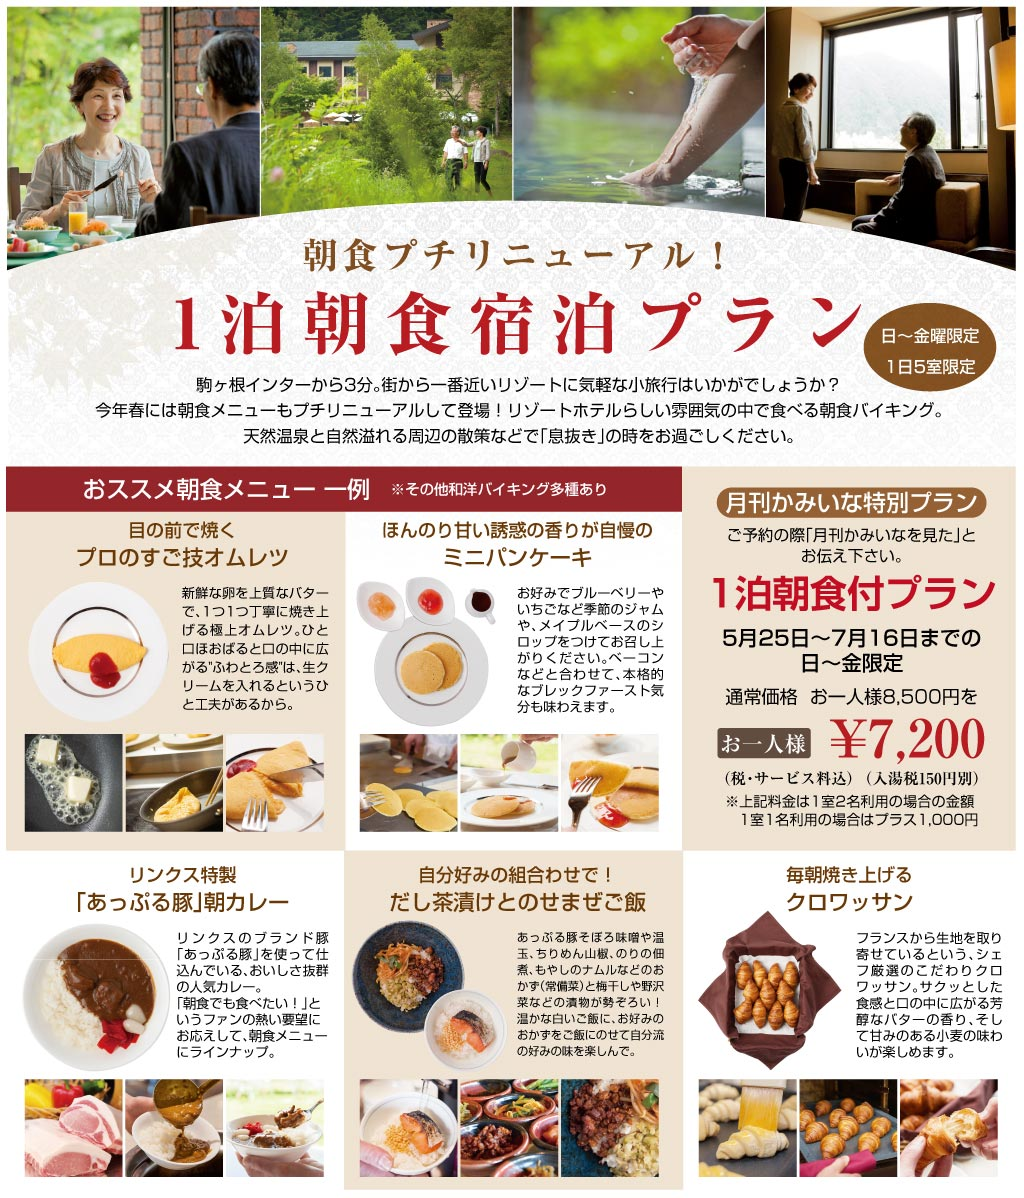 http://www.komagane-linx.co.jp/blogimages/kamiina201506-1.jpg